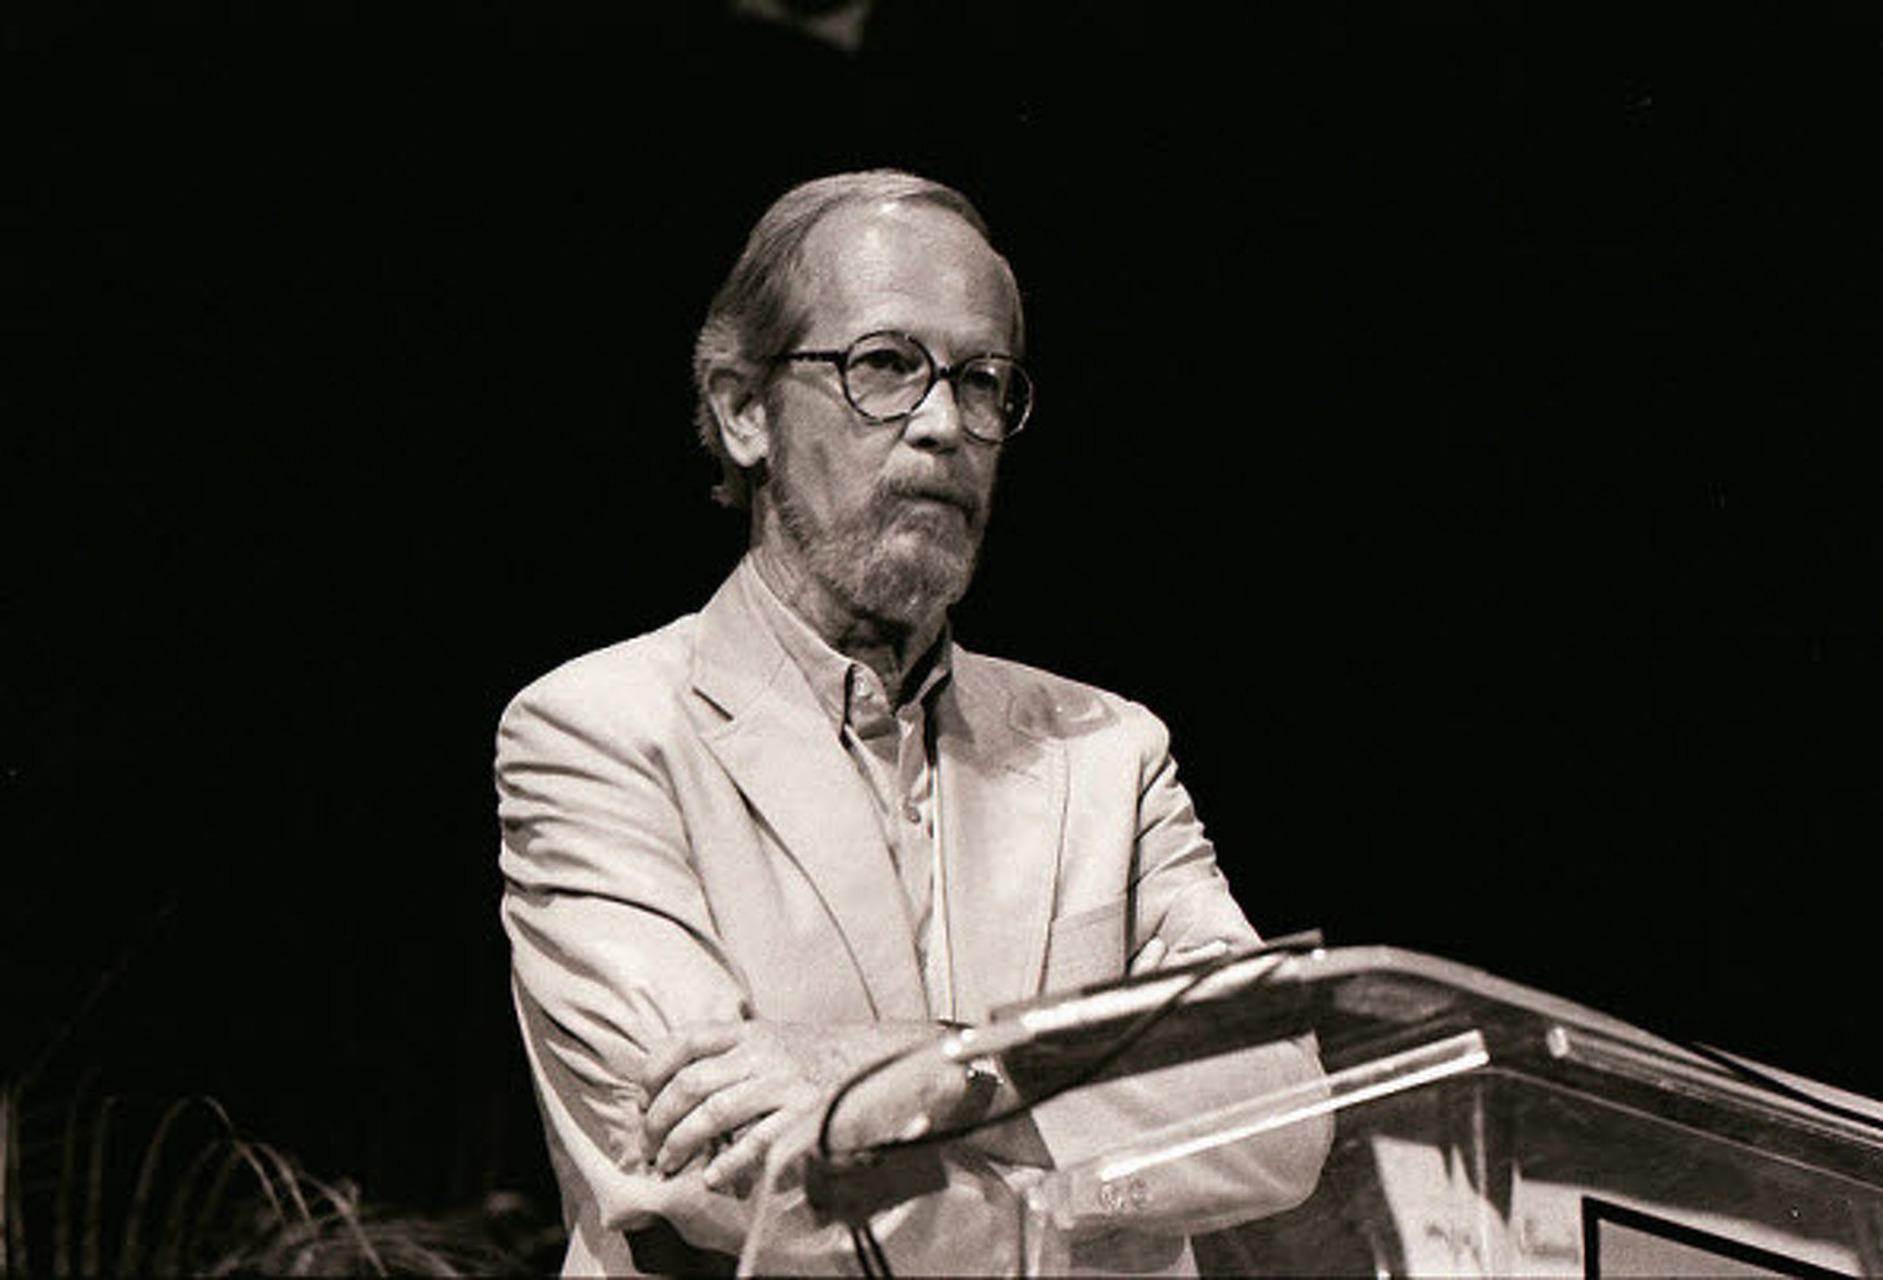 RIP Elmore Leonard: Novelist, Screenwriter, Detroit Ad Man